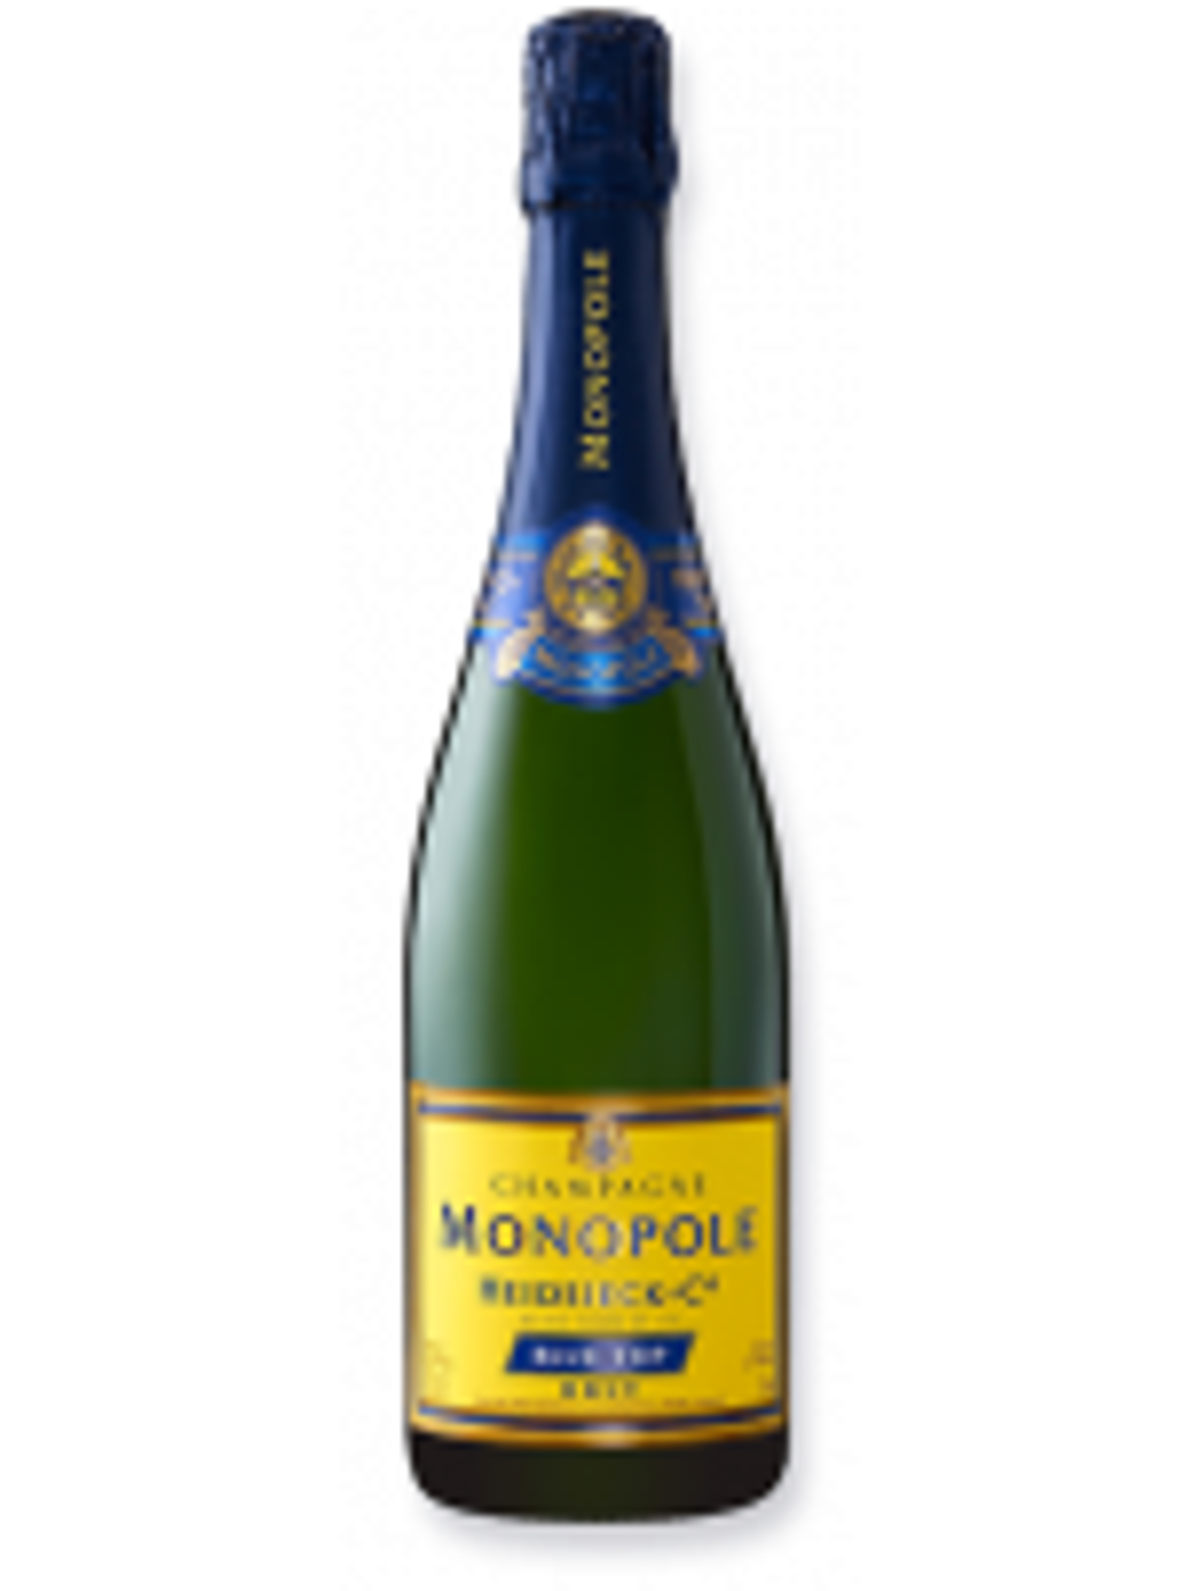 Heidsieck & Co. Monopole Brut Champagne Blue Top NV 75cl